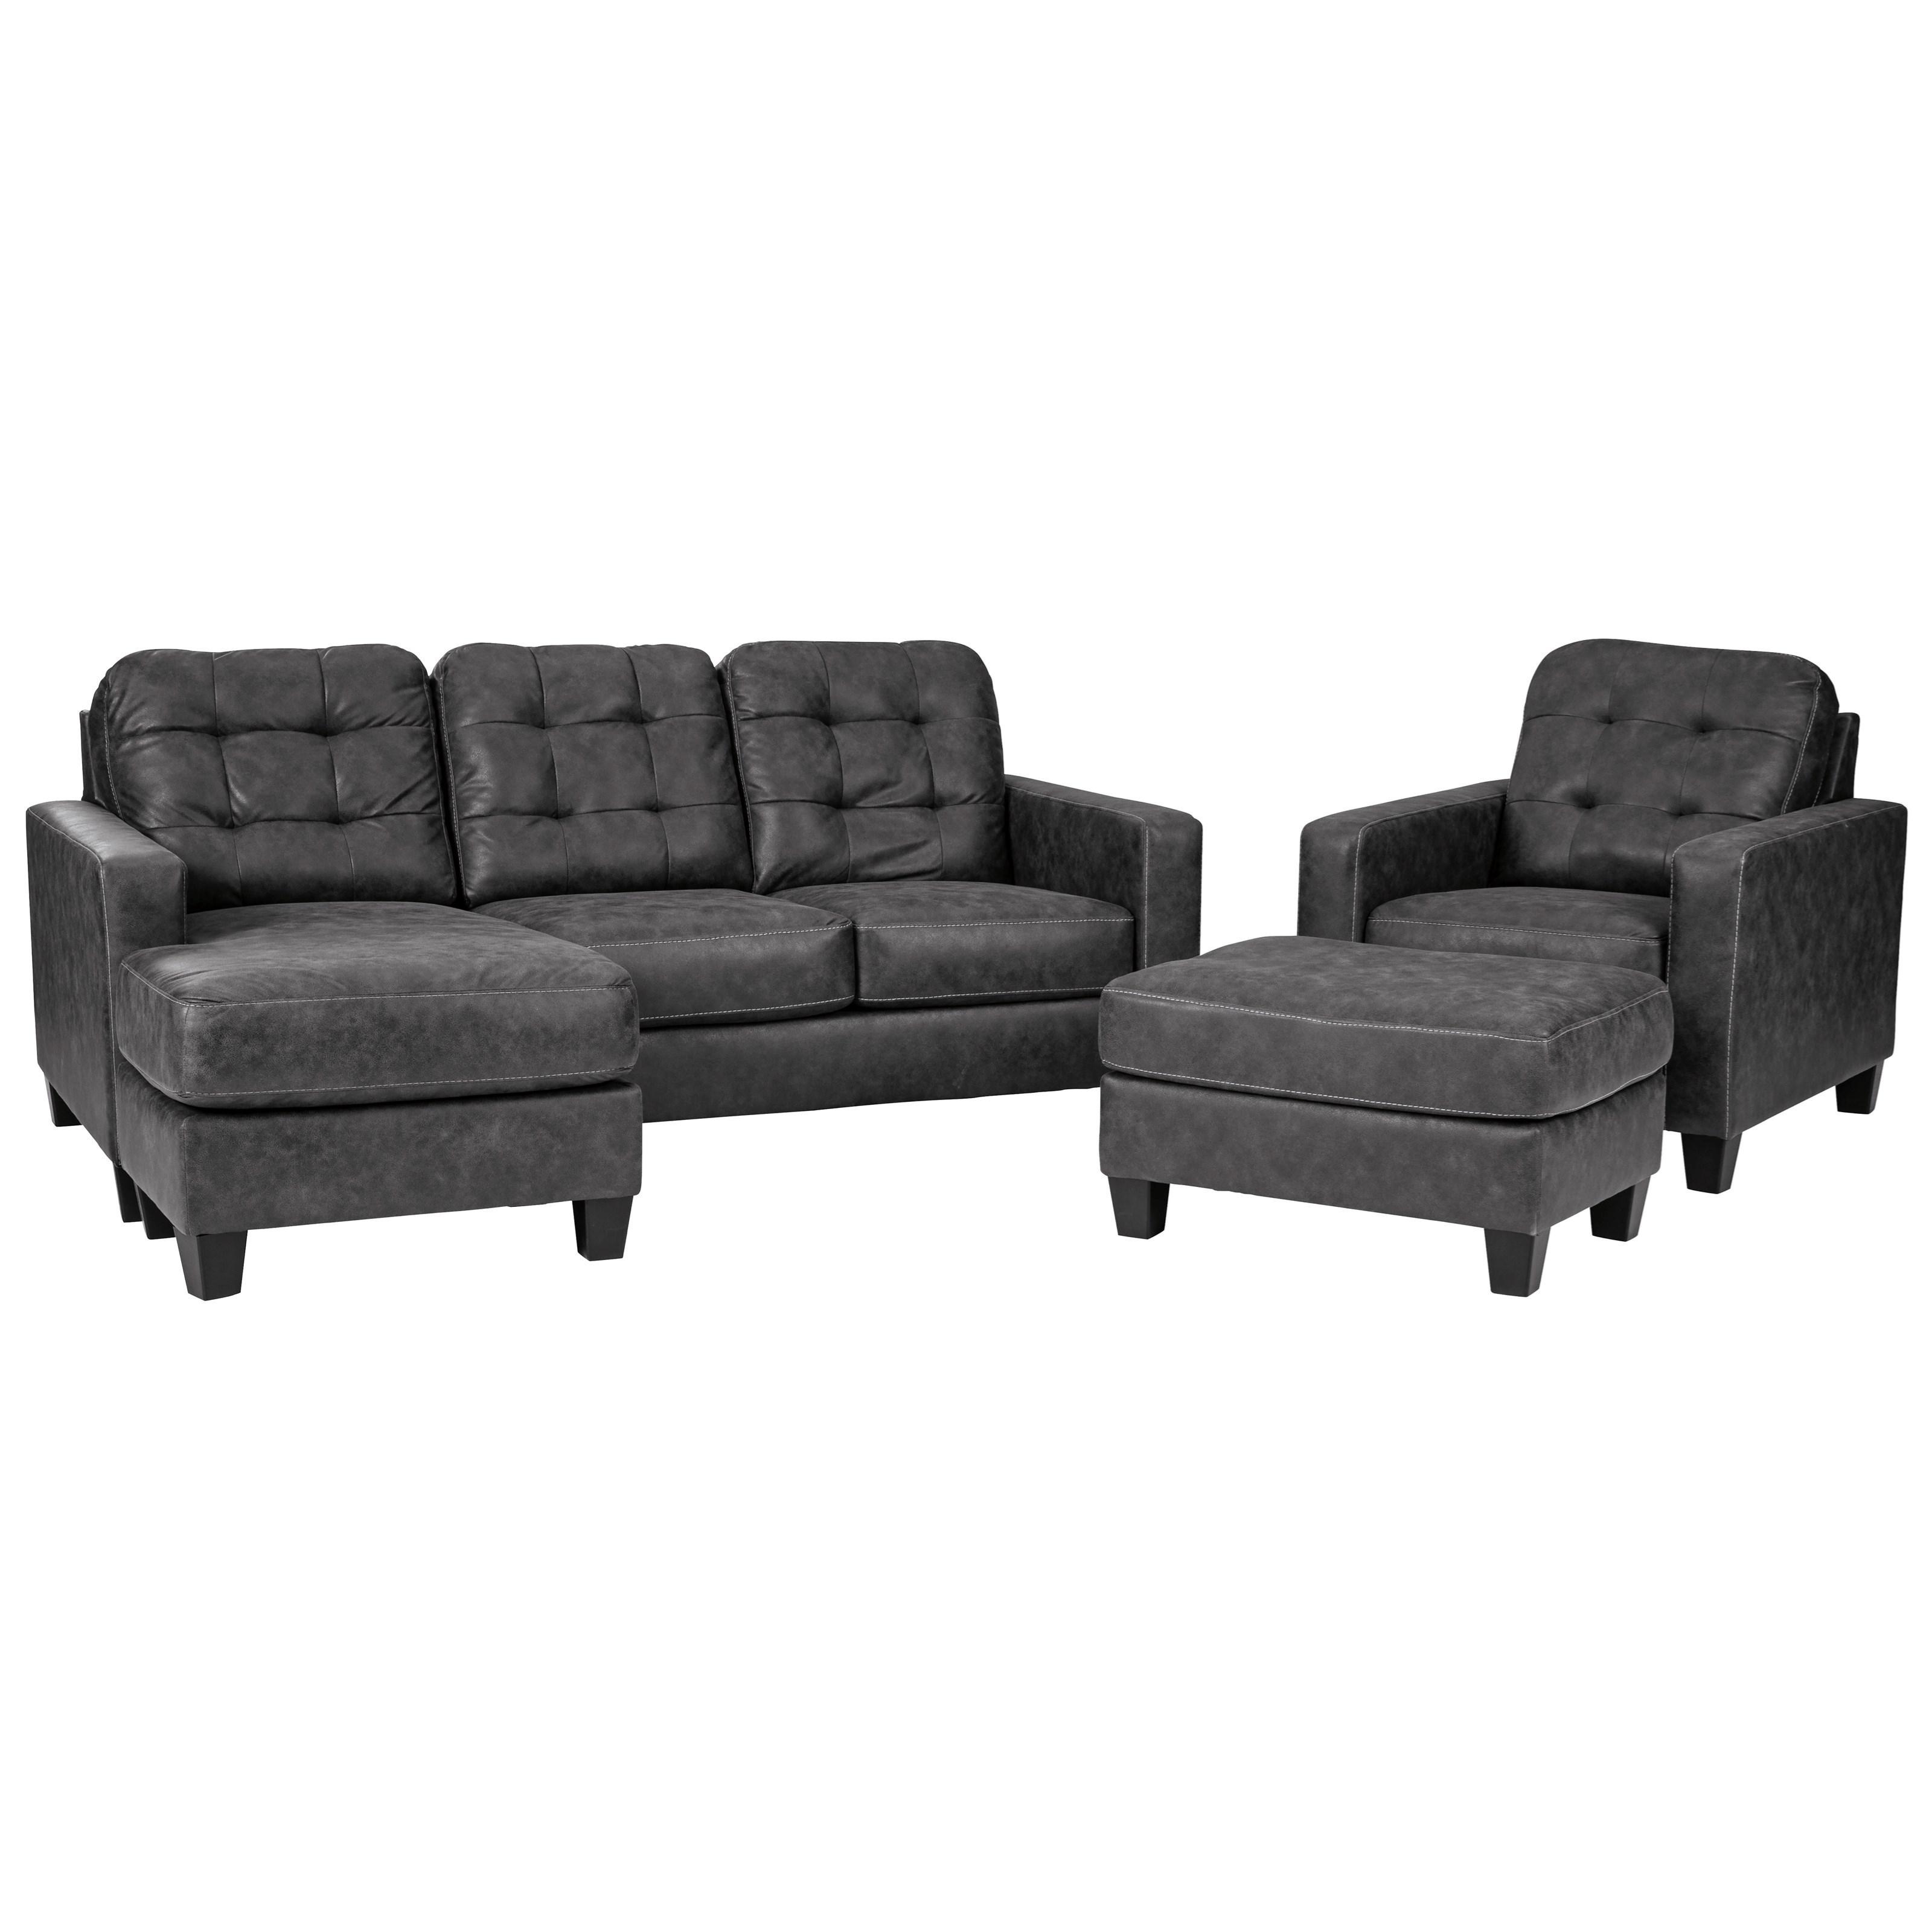 Venaldi Stationary Living Room Group by Benchcraft at Virginia Furniture Market